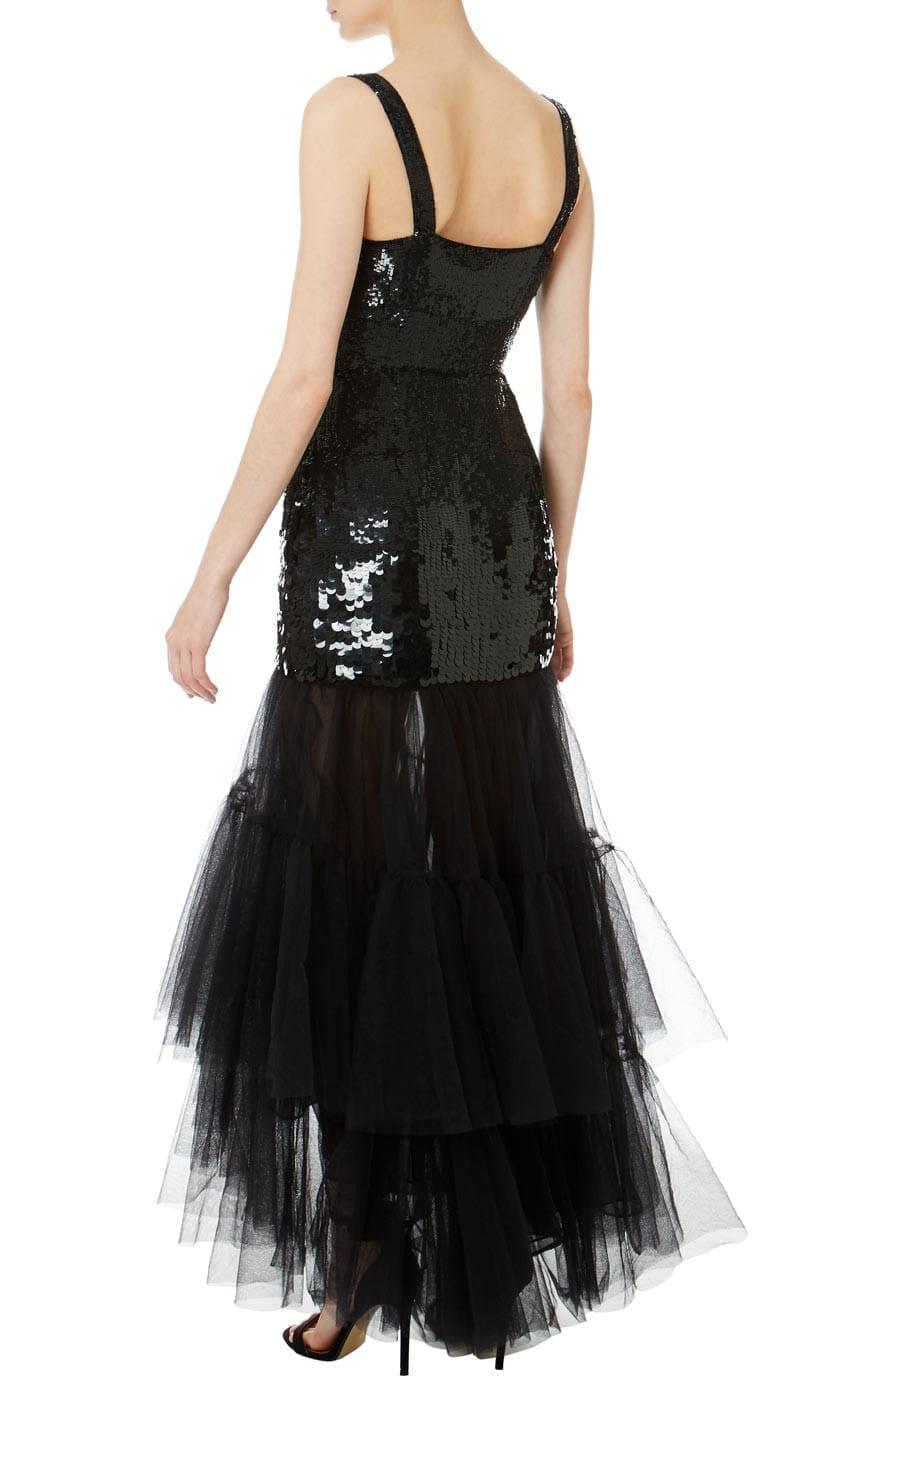 931609d7c3ba TEMPERLEY LONDON Bardot Midi Black Dress - We Select Dresses